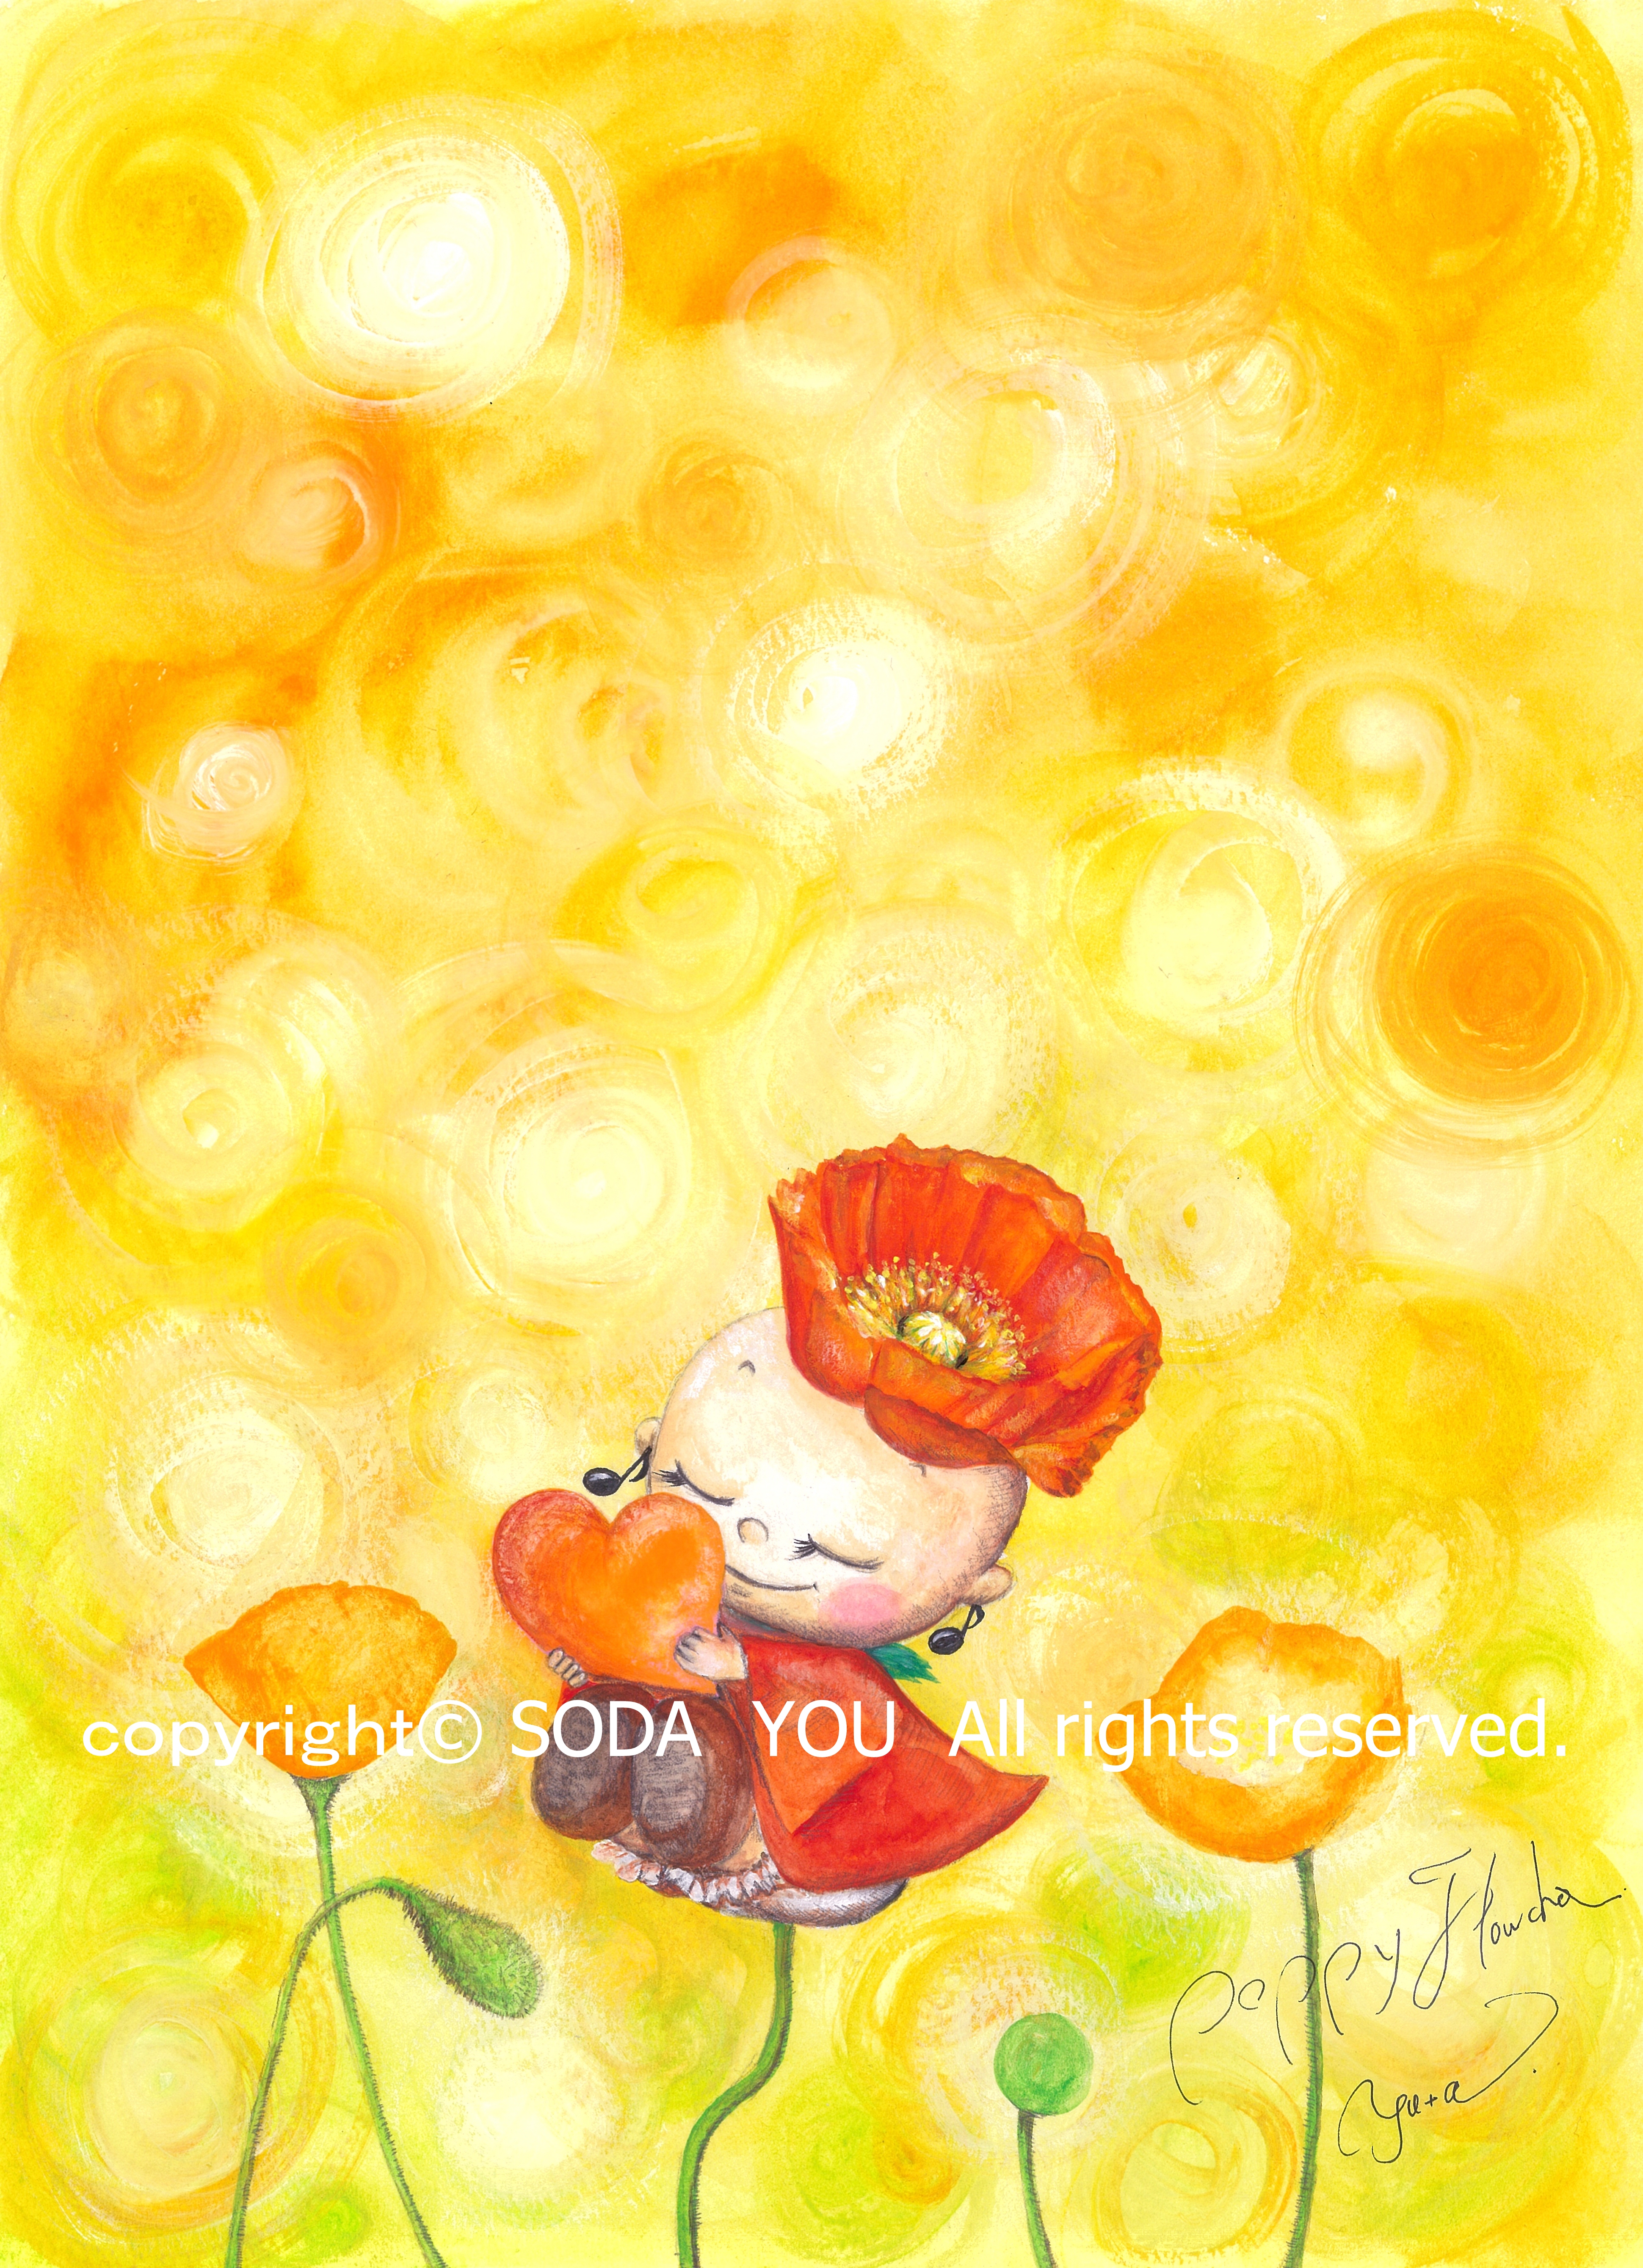 「 Poppy flowcha 」2012年 ポピーふらちゃ